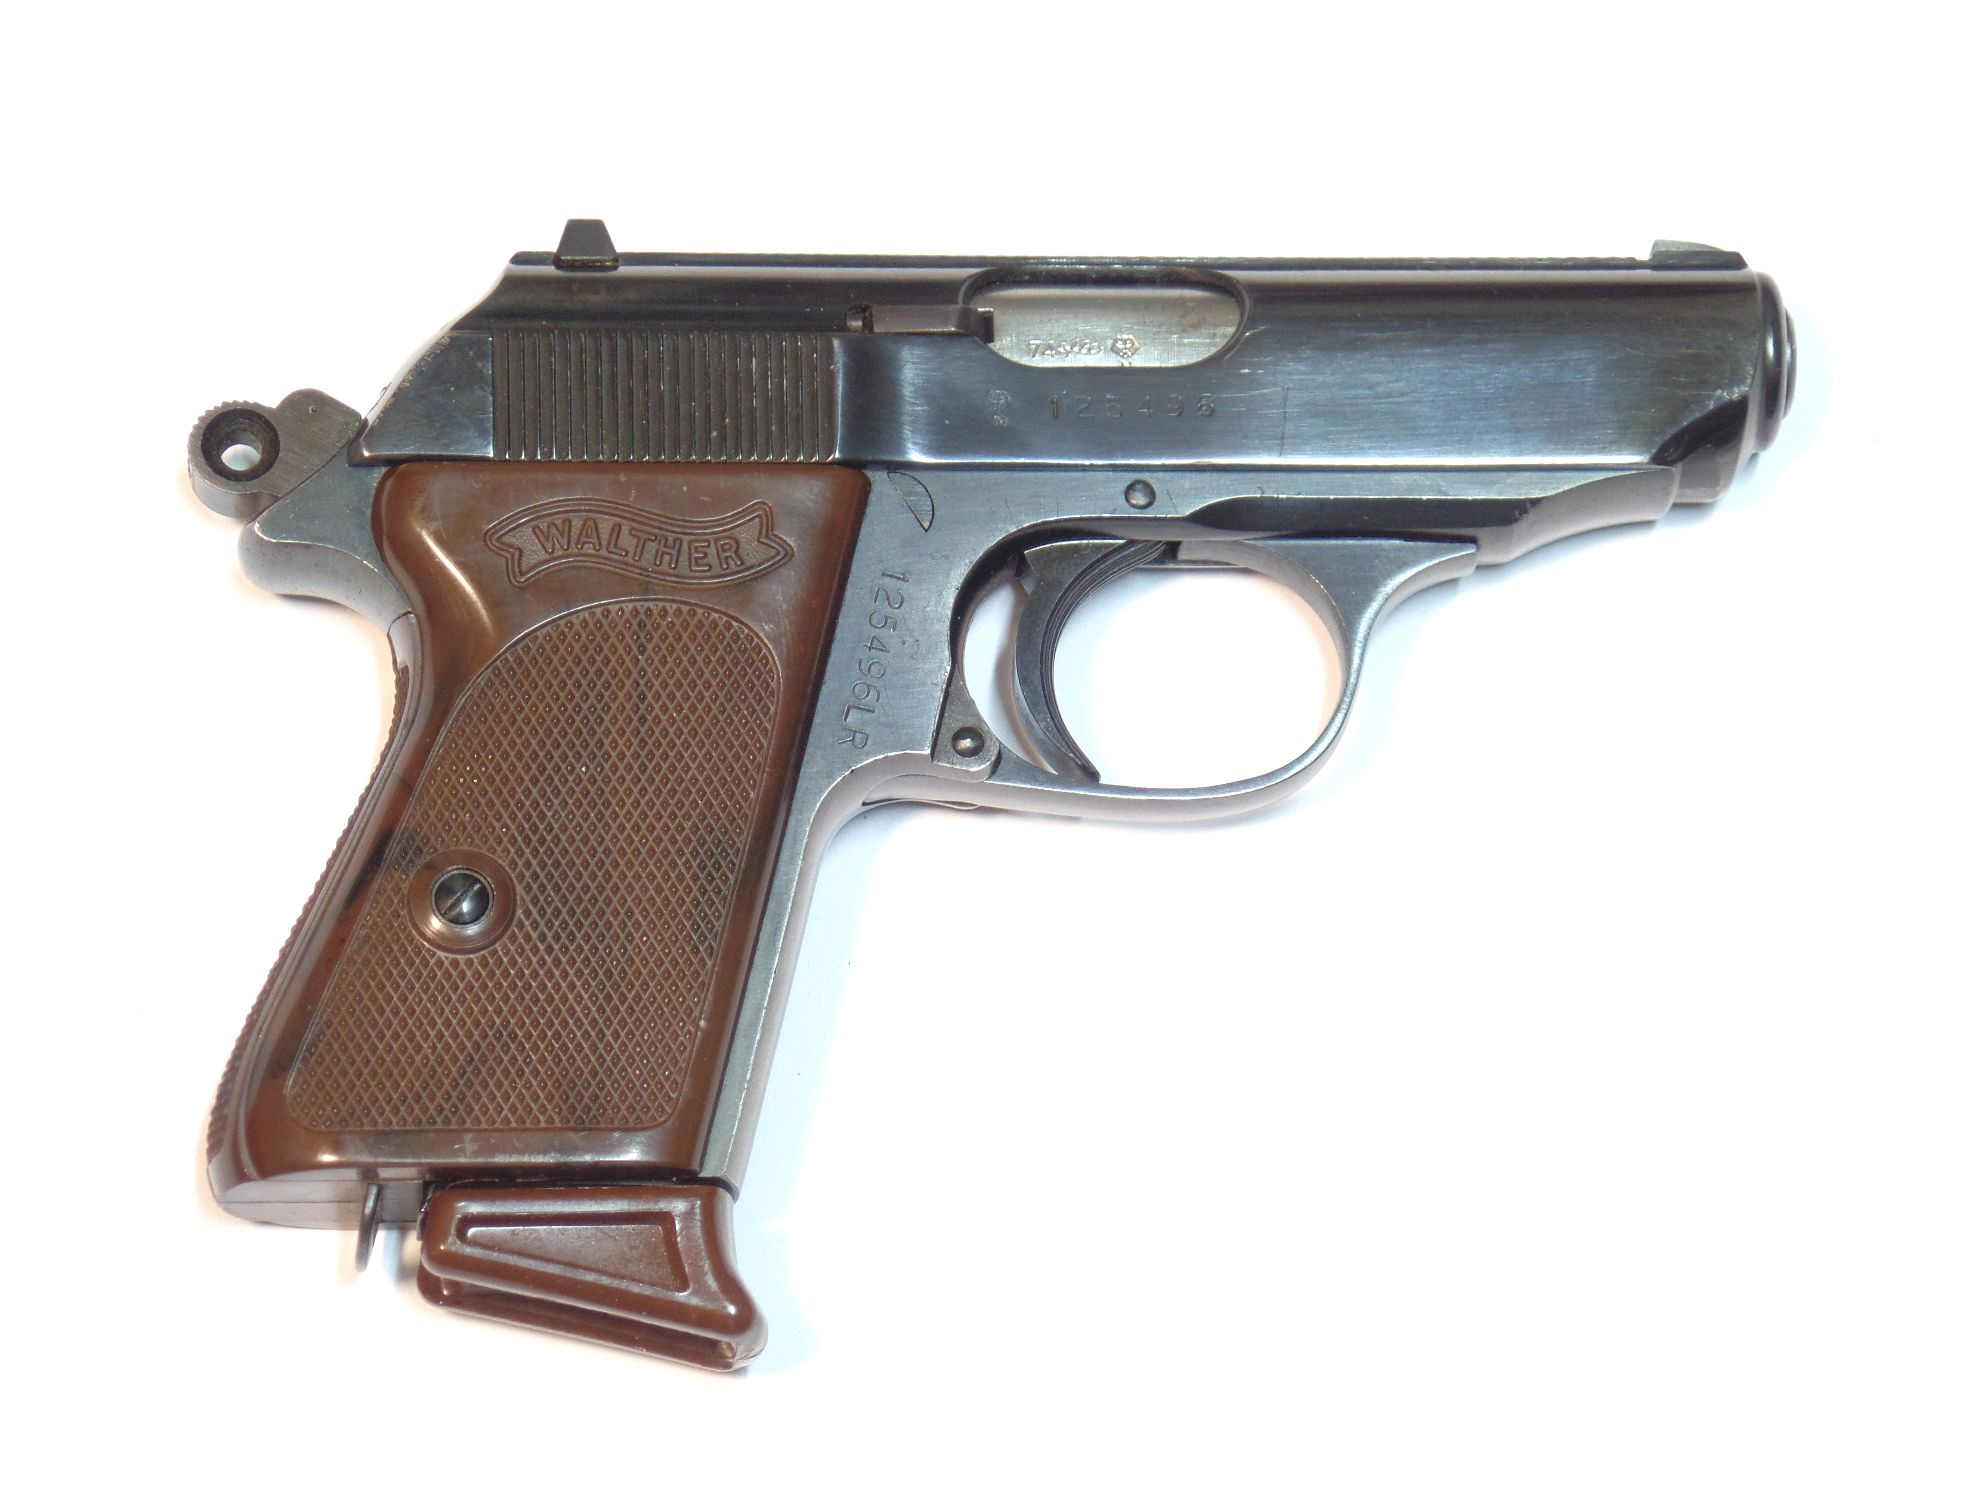 WALTHER PPK calibre 22LR